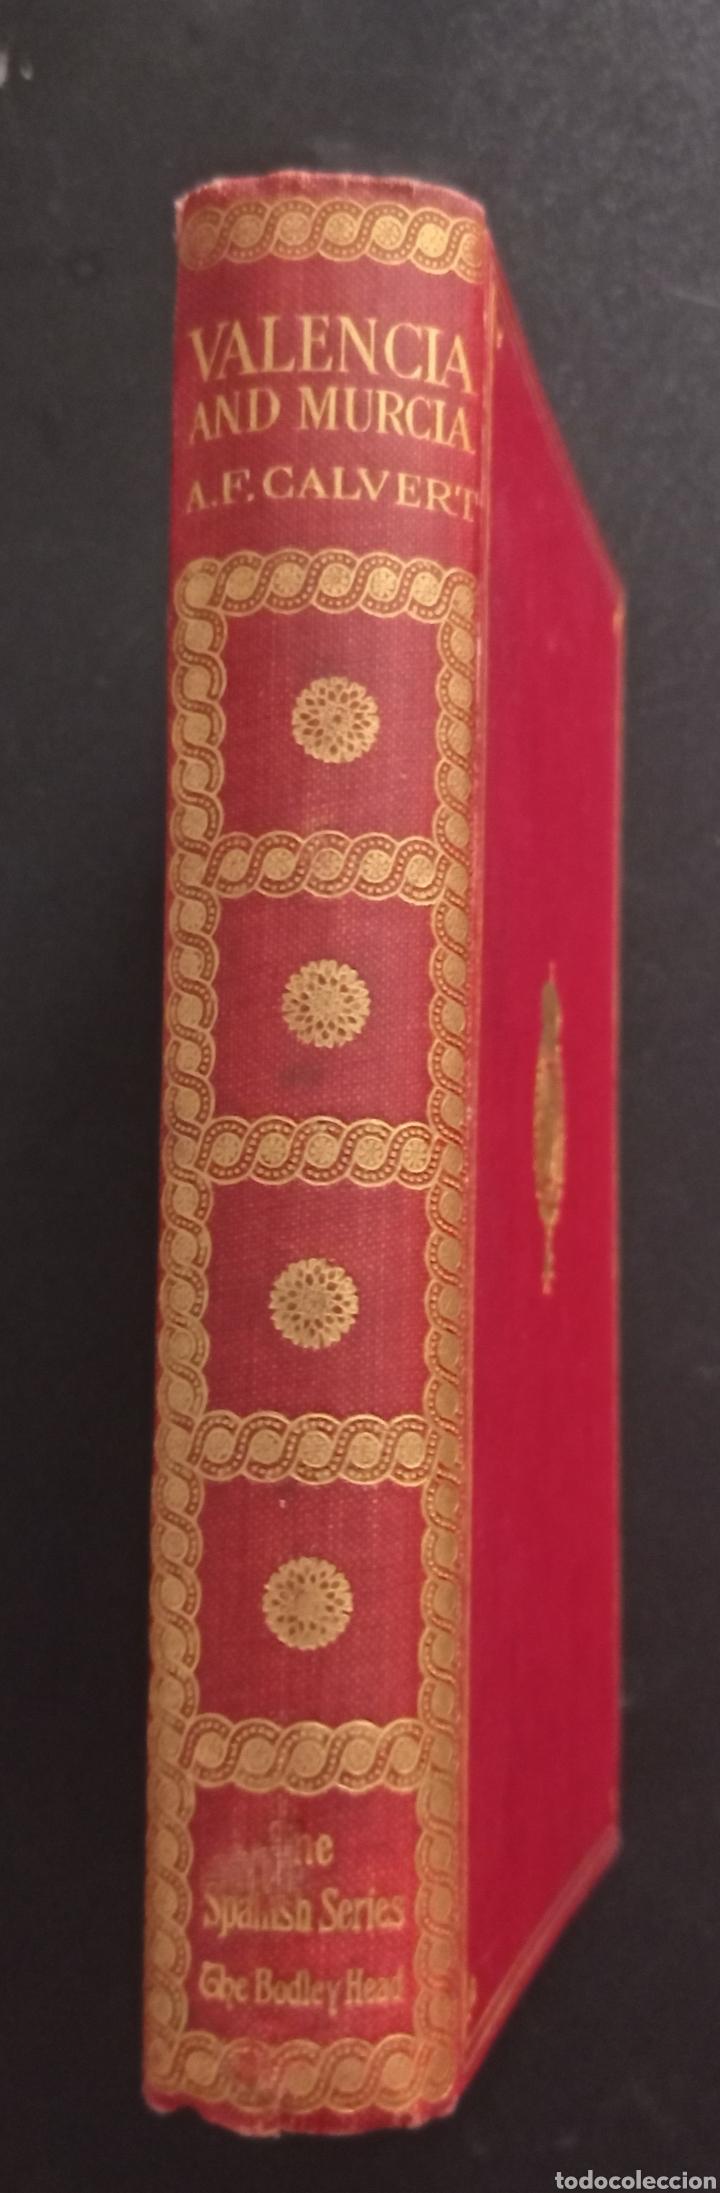 VALENCIA AND MURCIA. CALVERT, A. F. 1911 CARTAGENA LORCA ALICANTE ORIHUELA FOTOGRAFÍAS (Libros antiguos (hasta 1936), raros y curiosos - Historia Moderna)